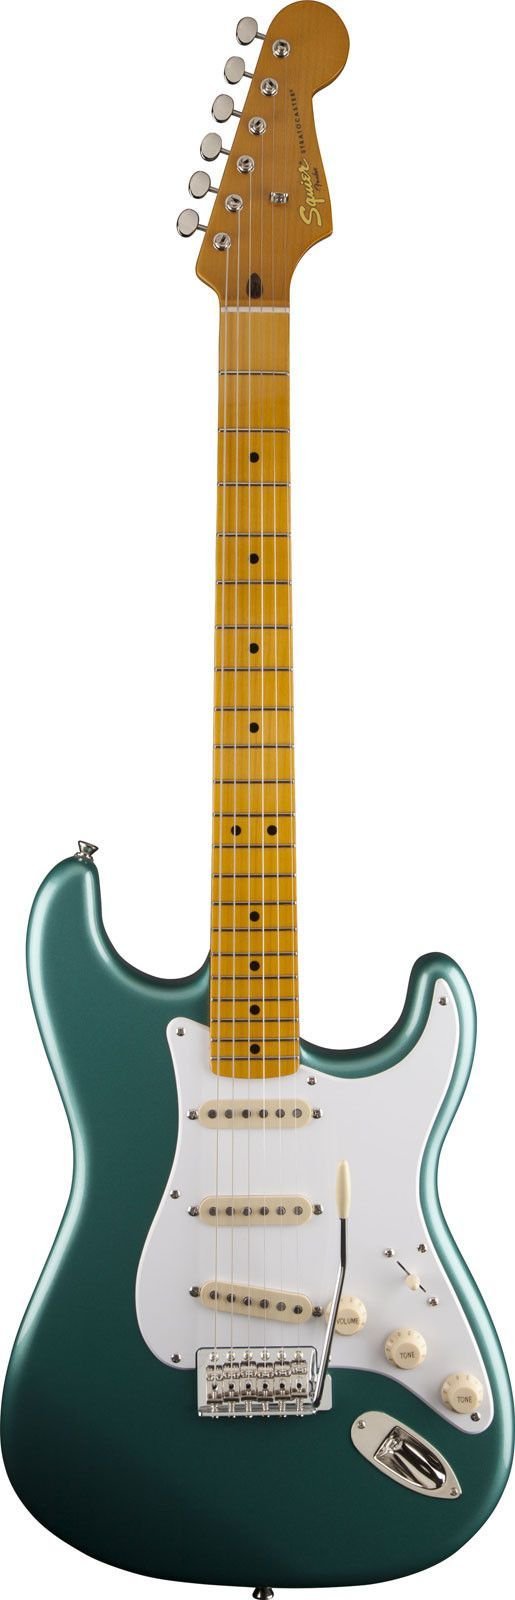 Squier Classic Vibe 50s Stratocaster Electric Guitar www.guitaristica.org #electricguitar #guitars #guitaristica